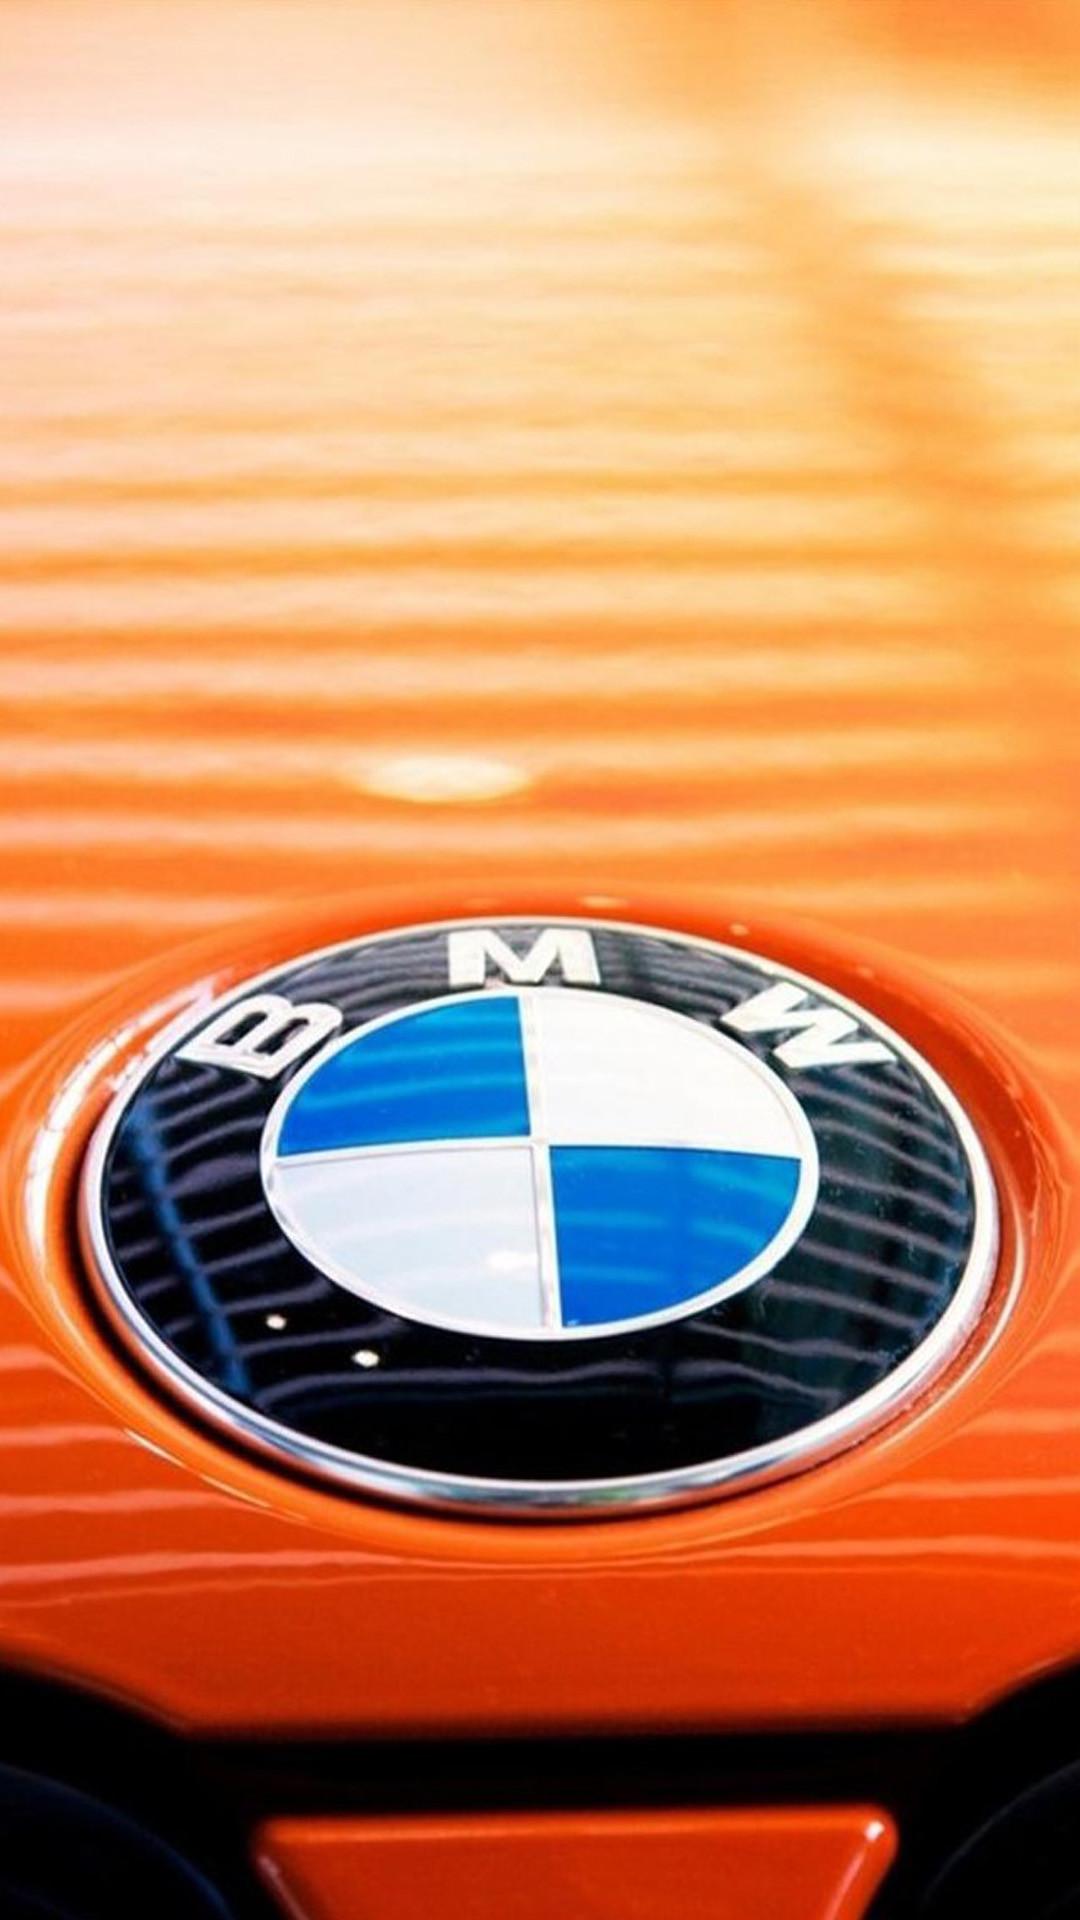 BMW Logo HD Wallpaper (70+ images)